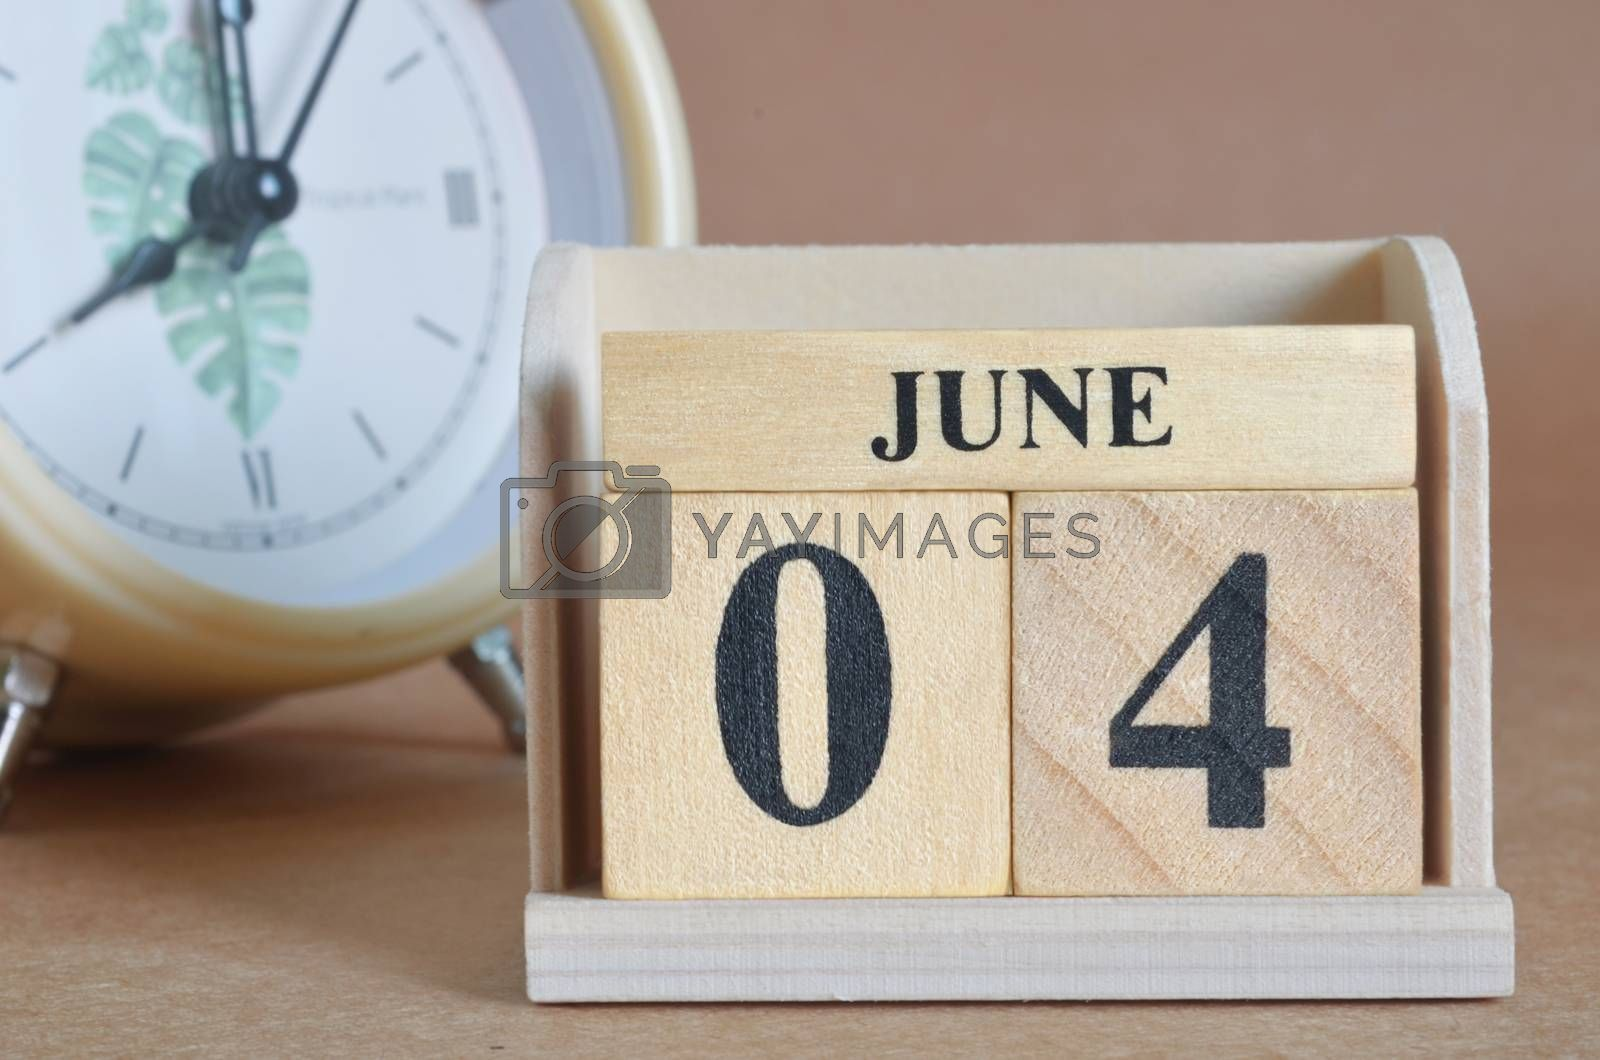 June 4 by Mrfrost